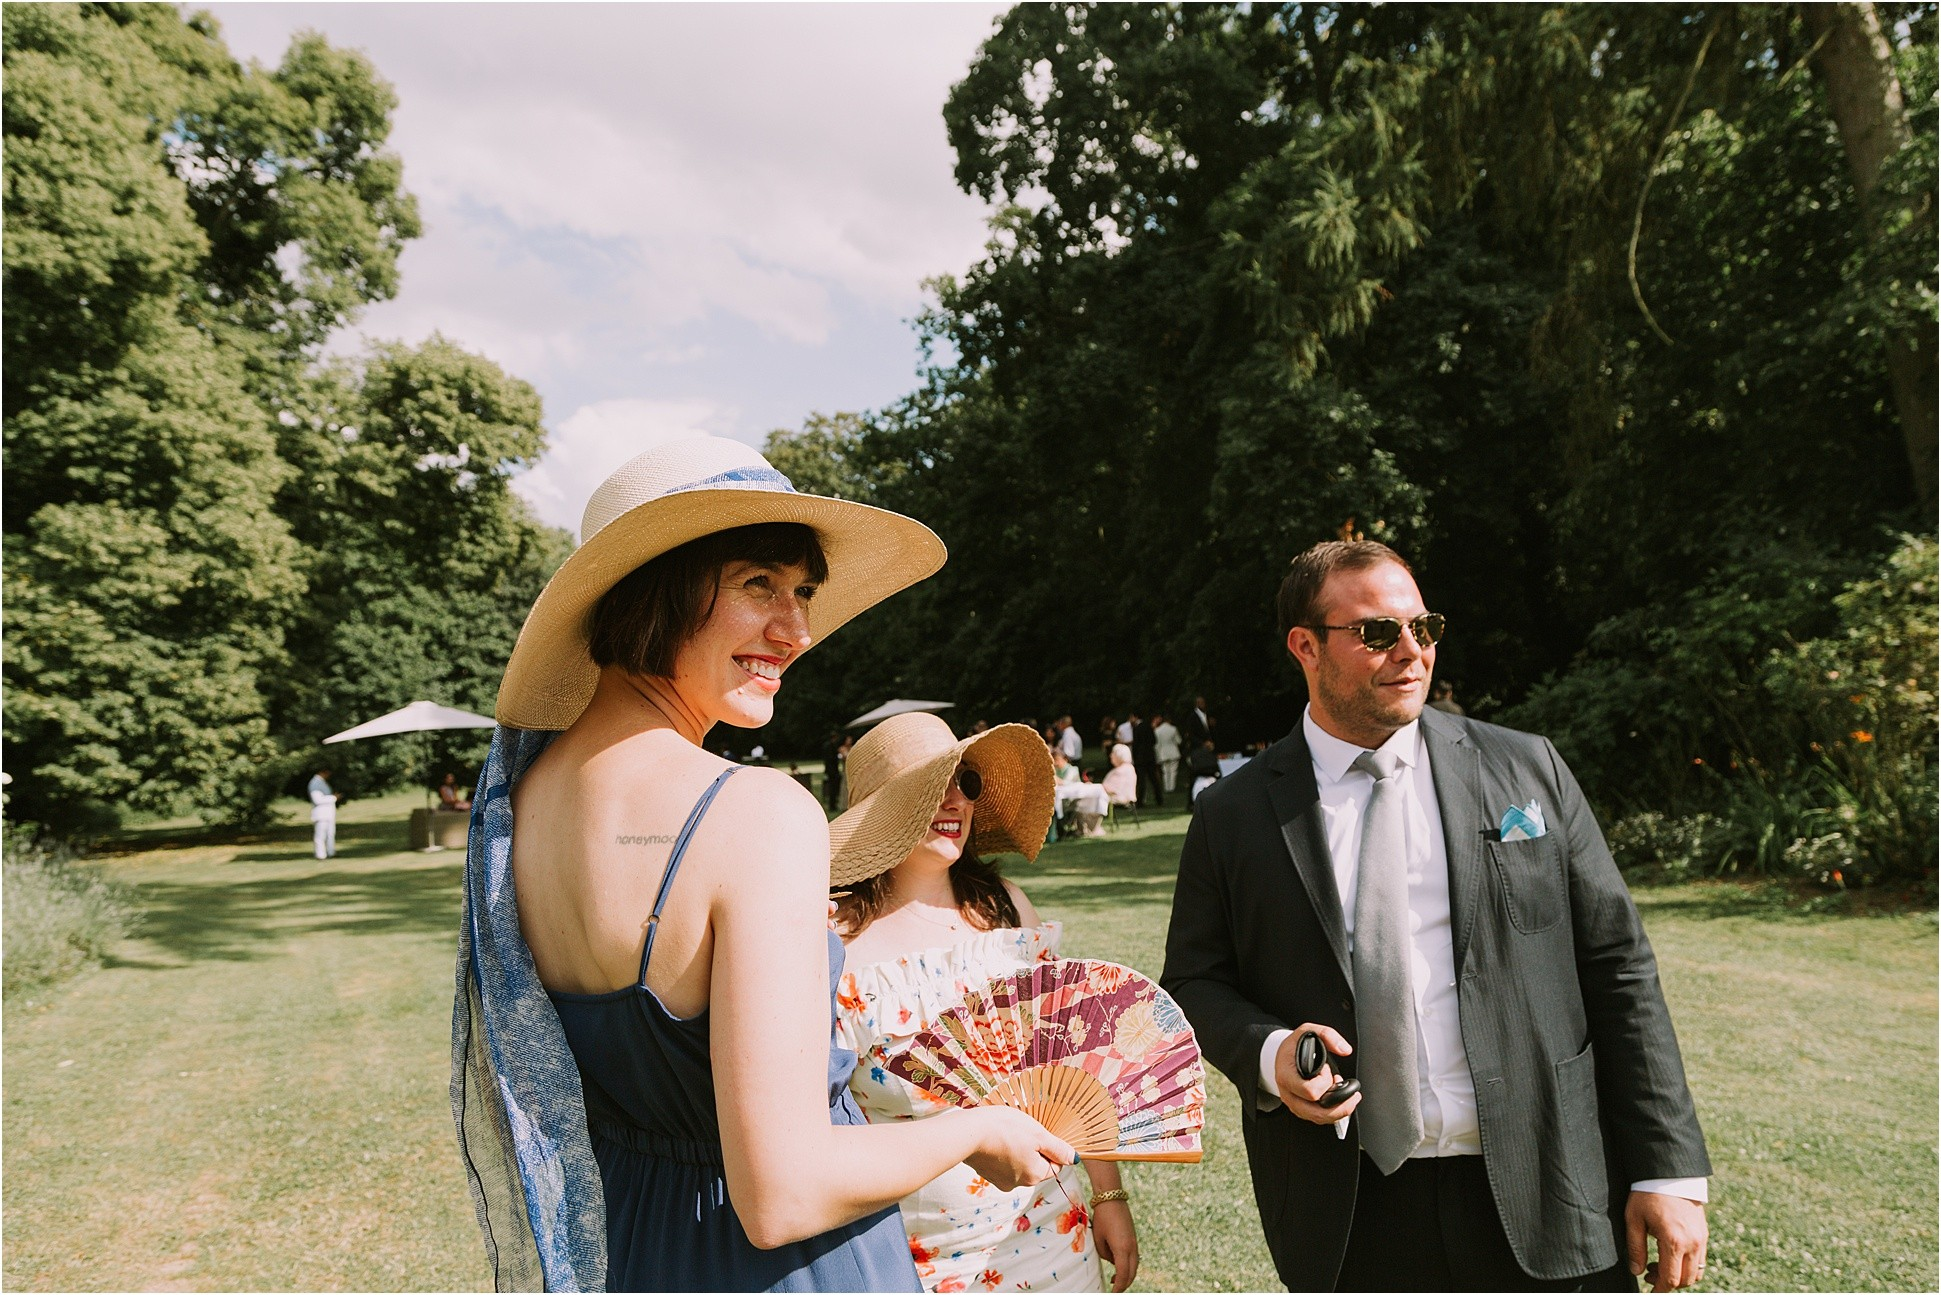 Kateryna-photos-photographe-mariage-chateau-st-paterne-mayenne-normandie_0129.jpg